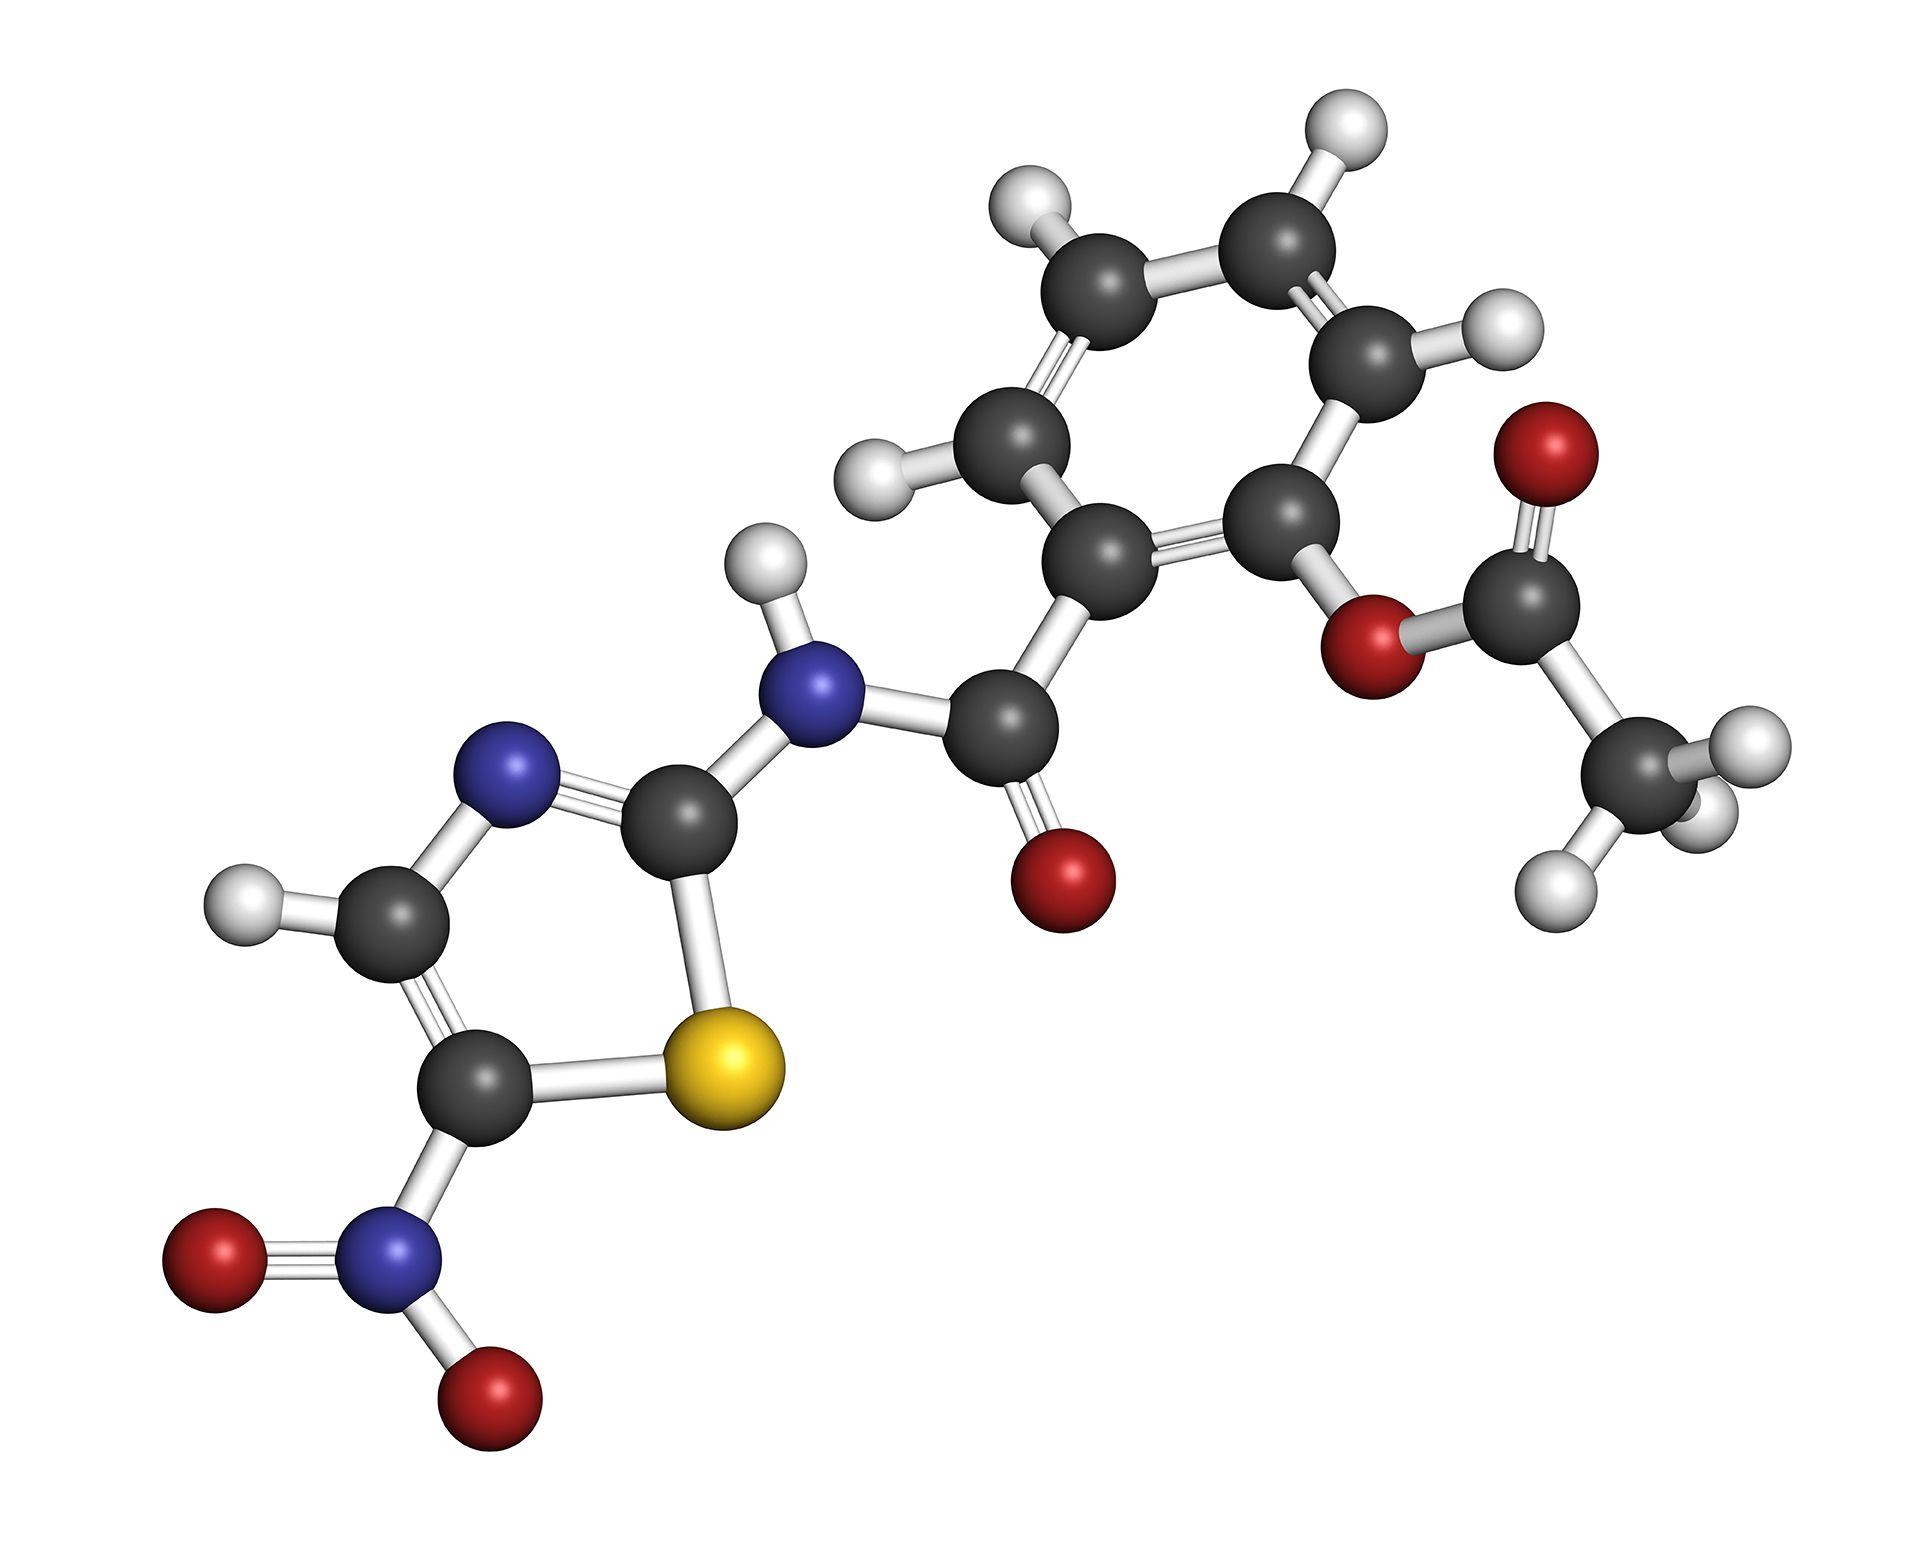 nitazoxanida